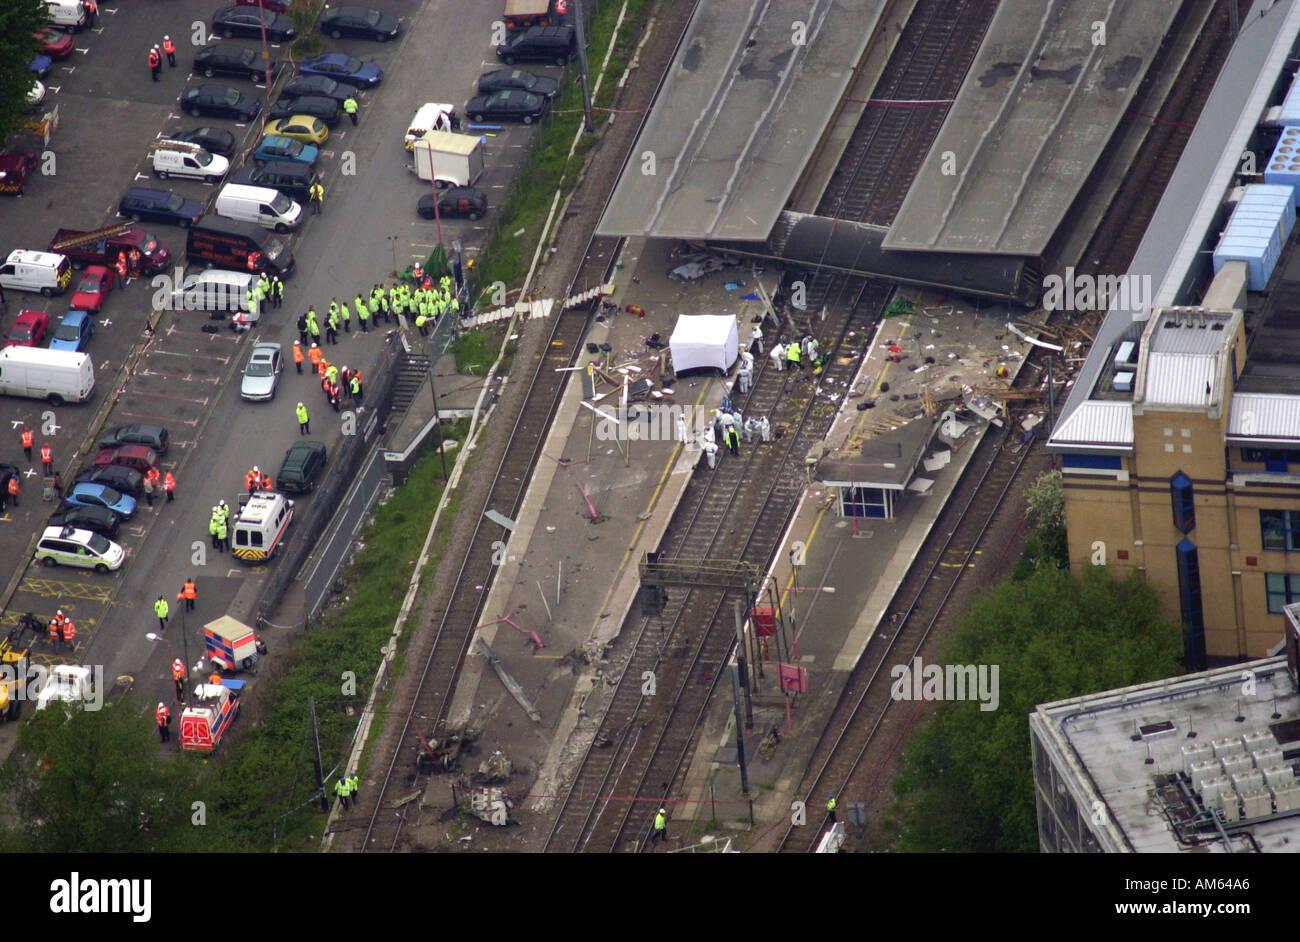 Potters Bar train crash Aerial view Hertfordshire UK - Stock Image